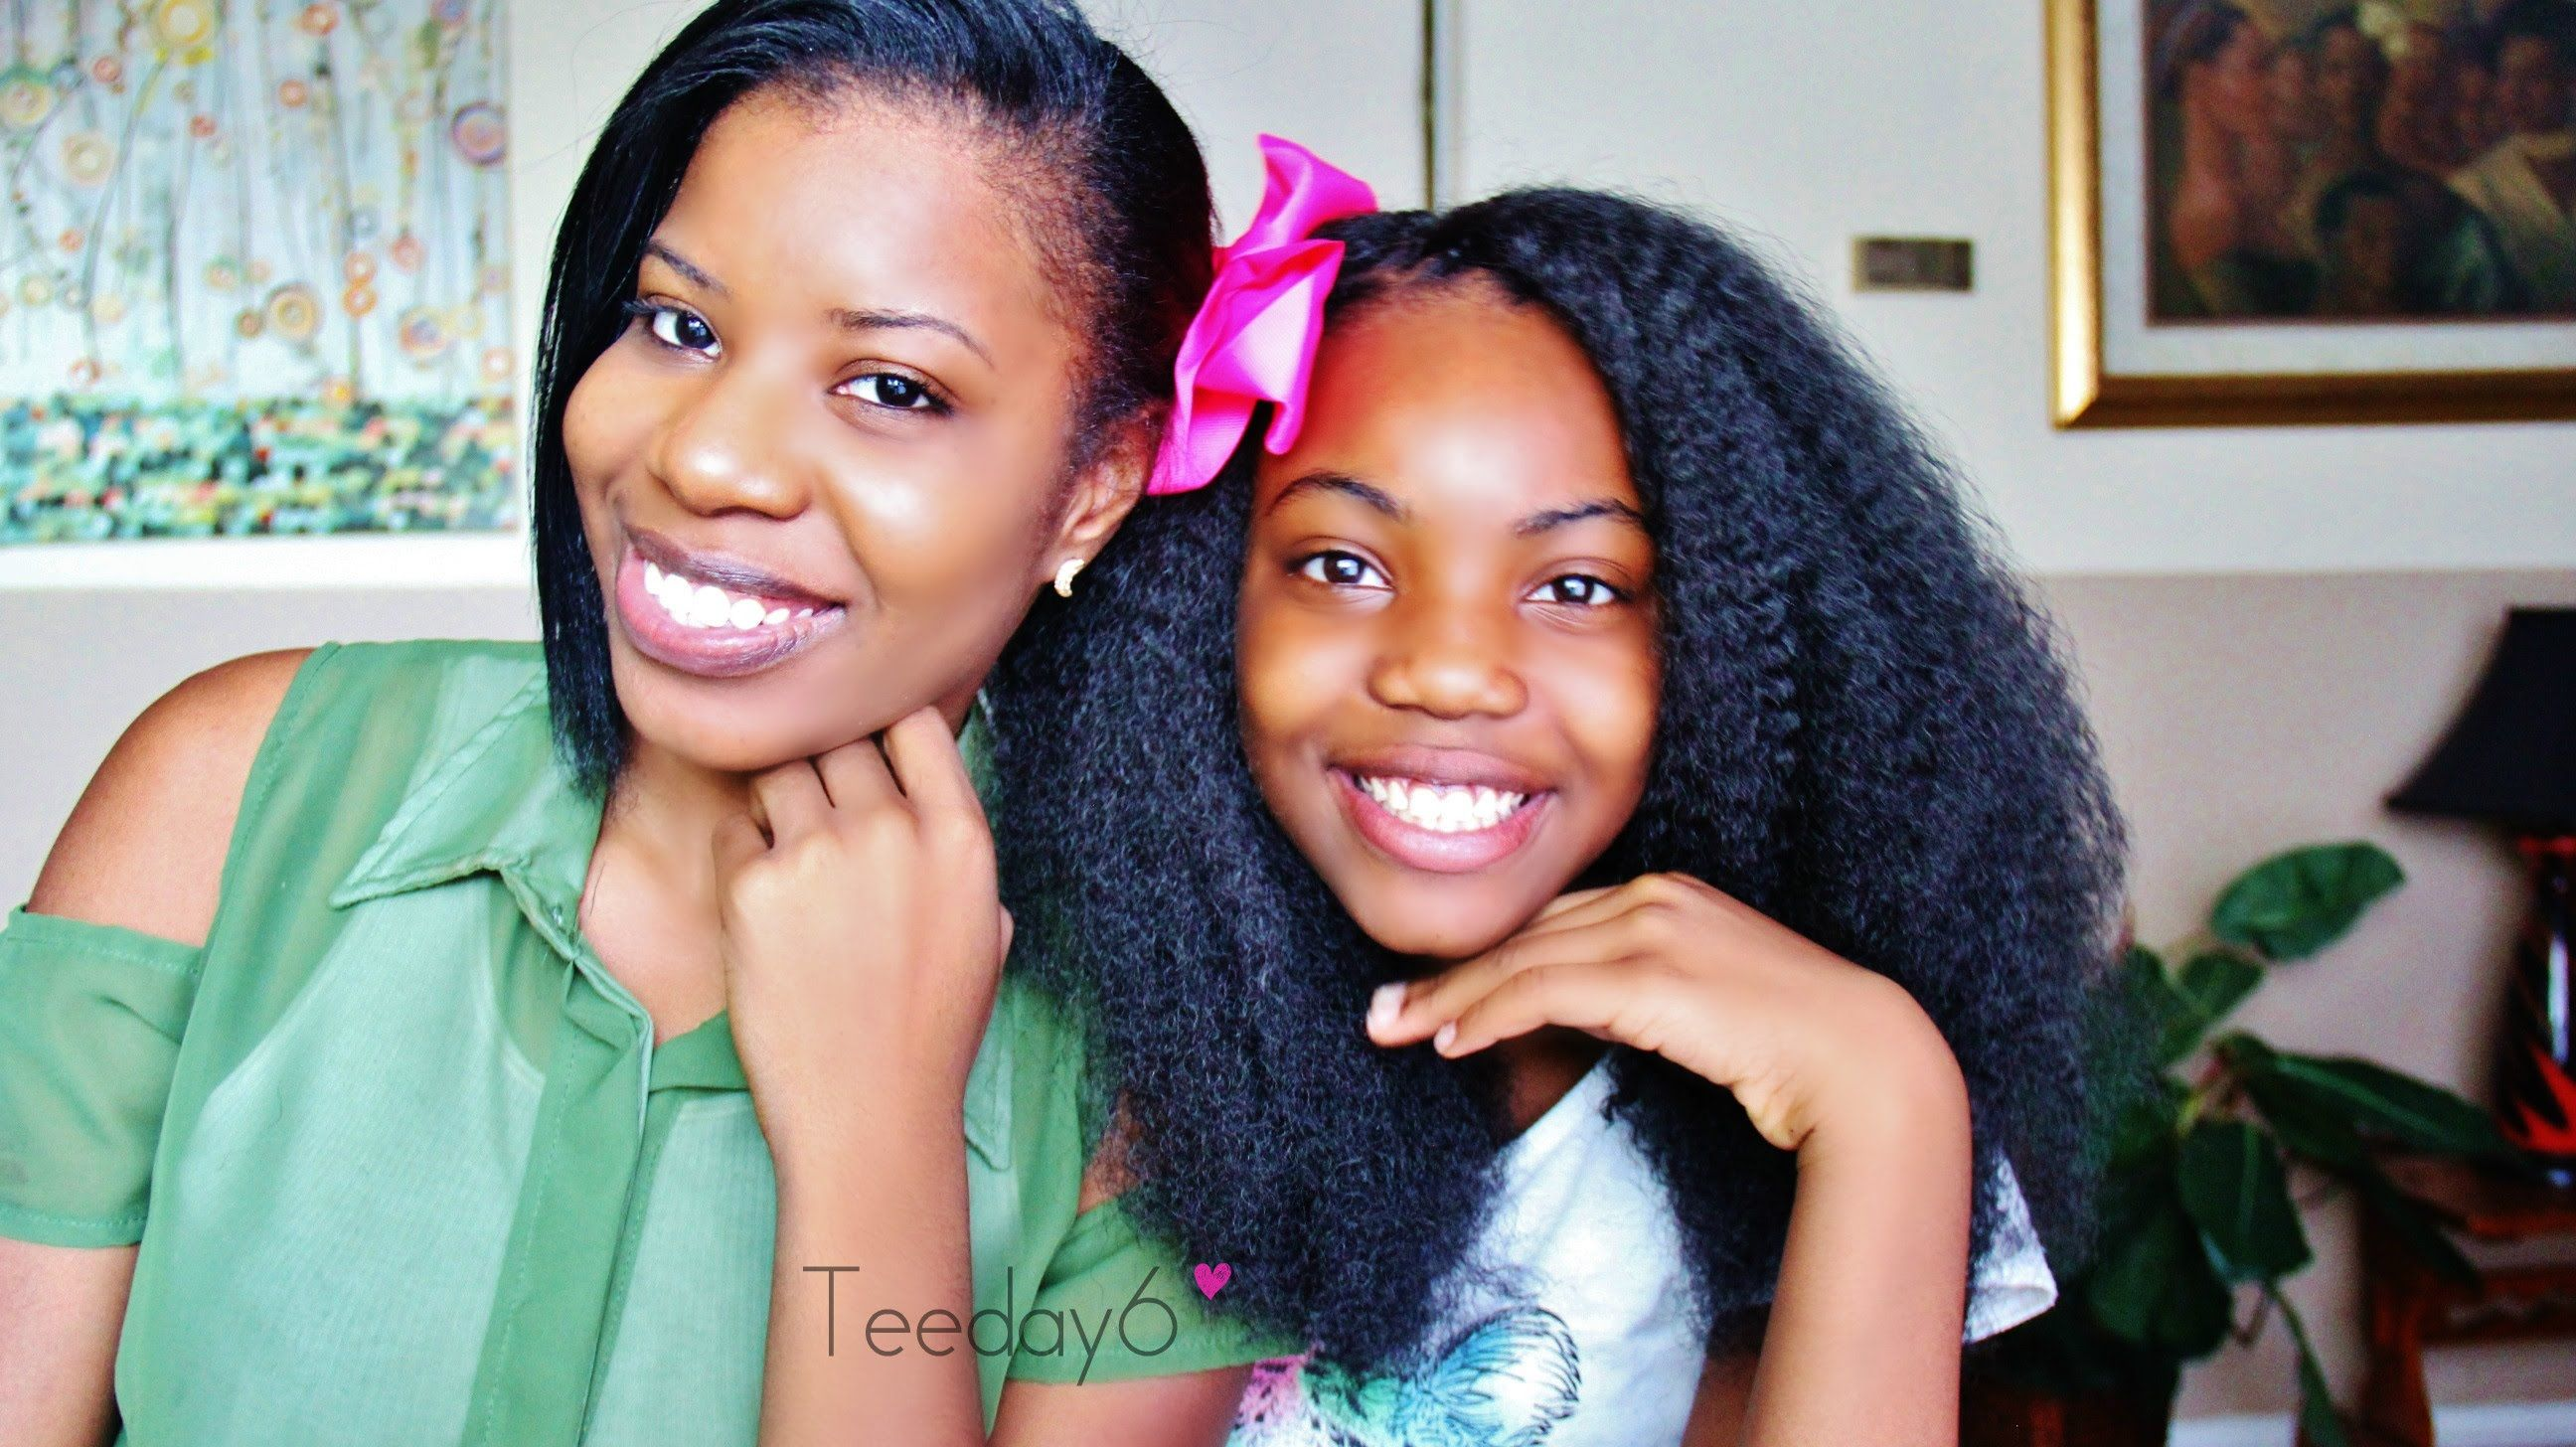 Does crochet braid damage hair fastest - 11 Year Old Does Her Own Crochet Braids Teeday6